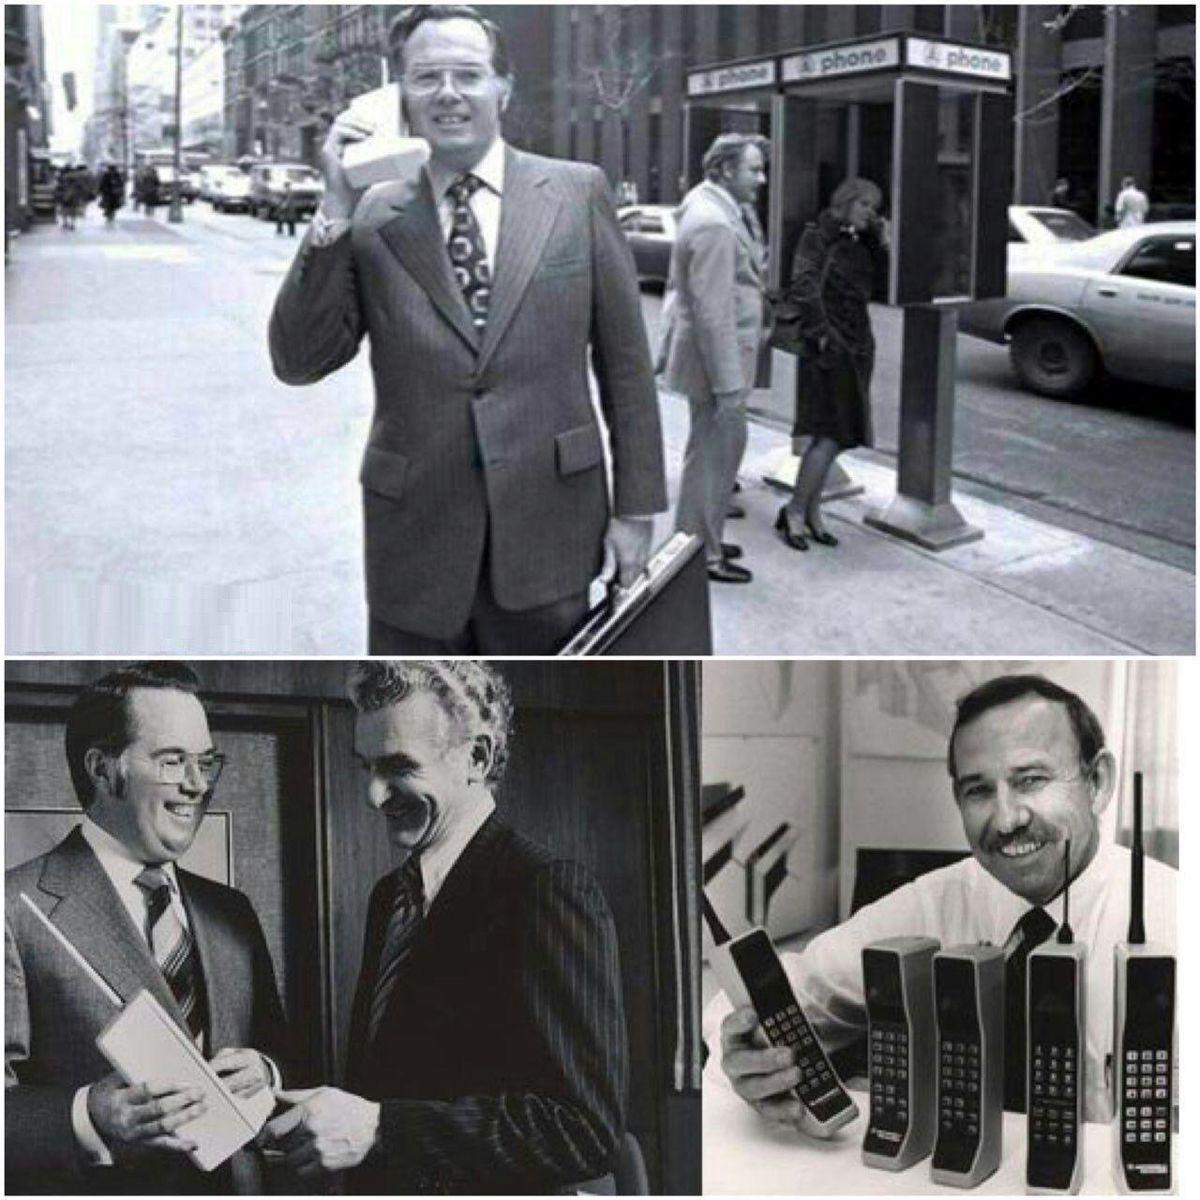 اولین تلفن همراه جهان/عکس